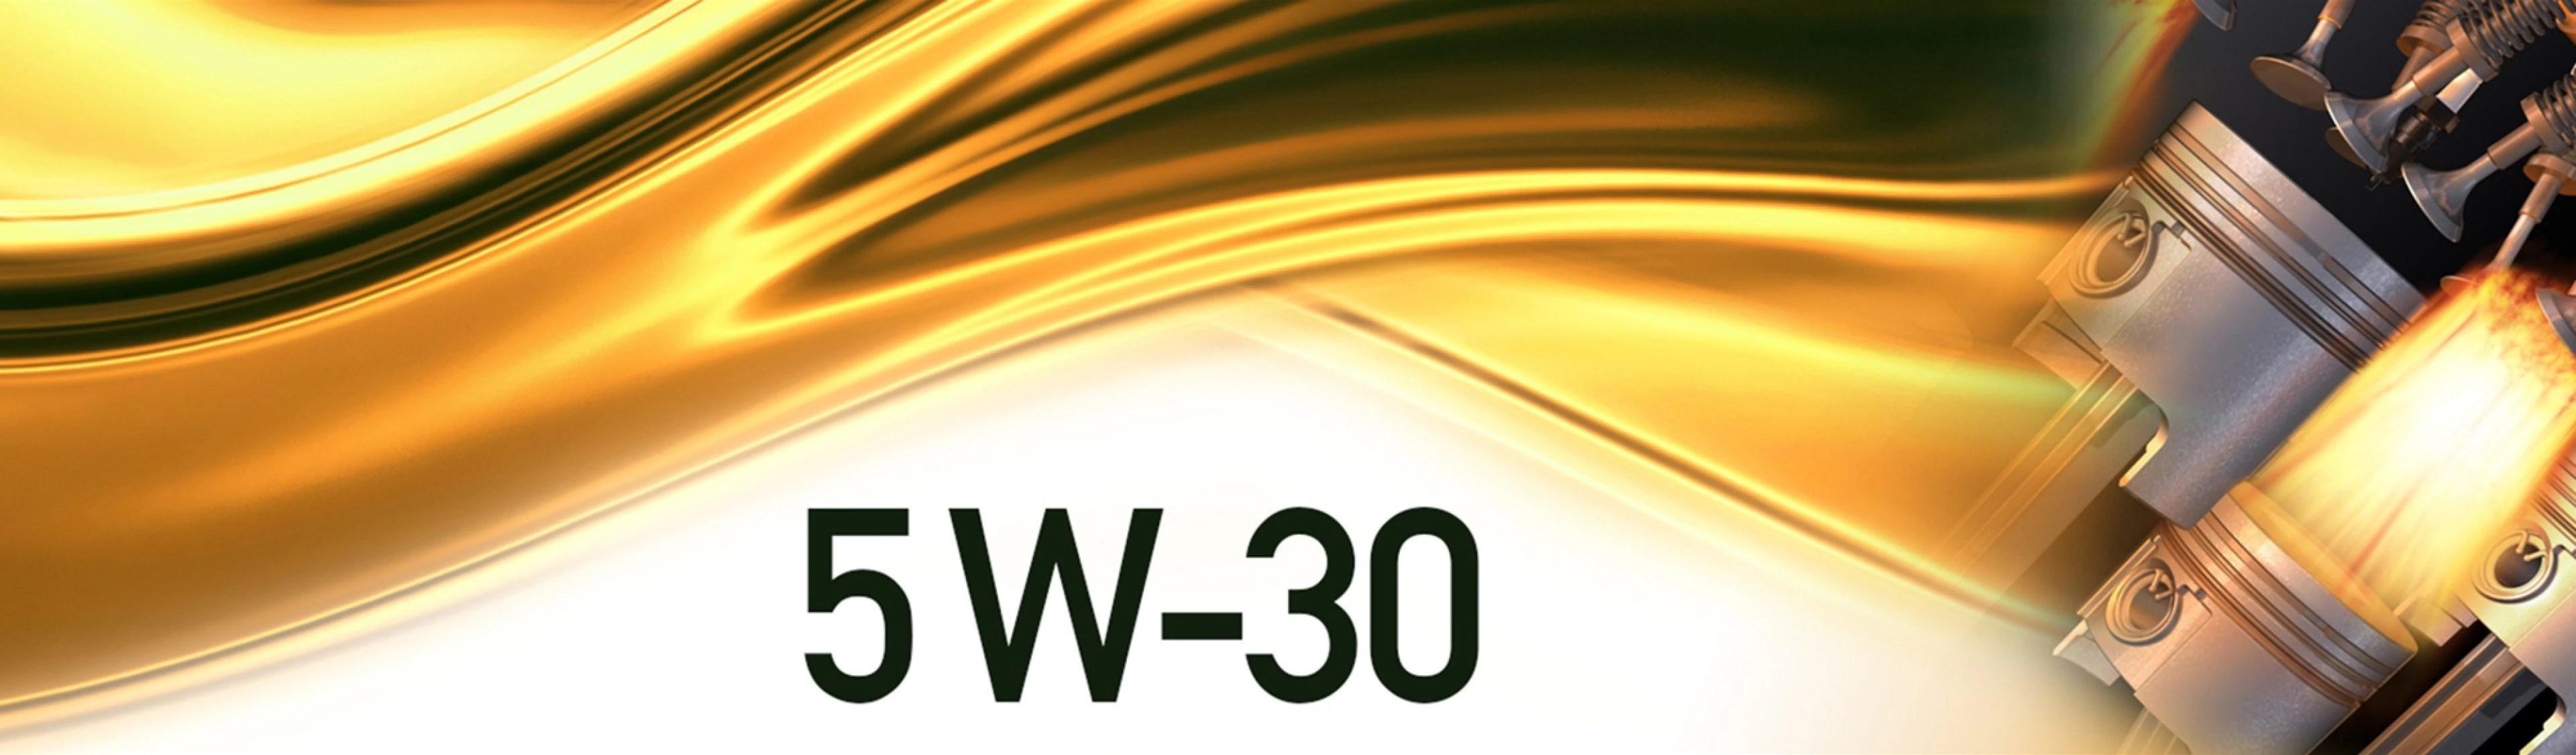 5w 30 Motor Oil Fluids Home